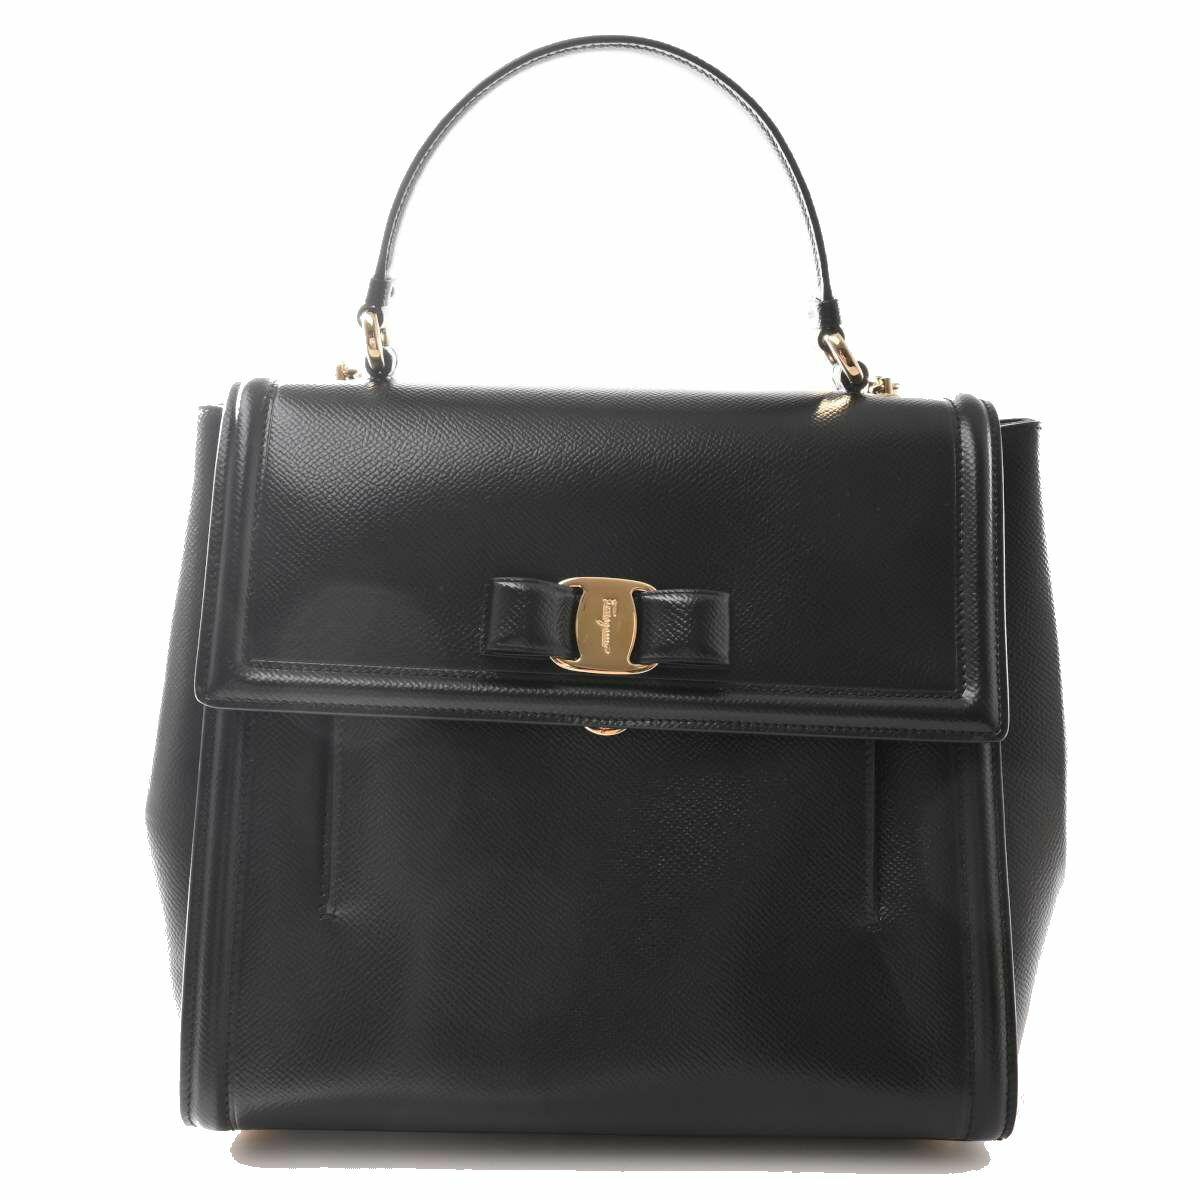 Salvatore Ferragamo Ferragamo Leather Vala Ribbon 2WAY Handbag Black